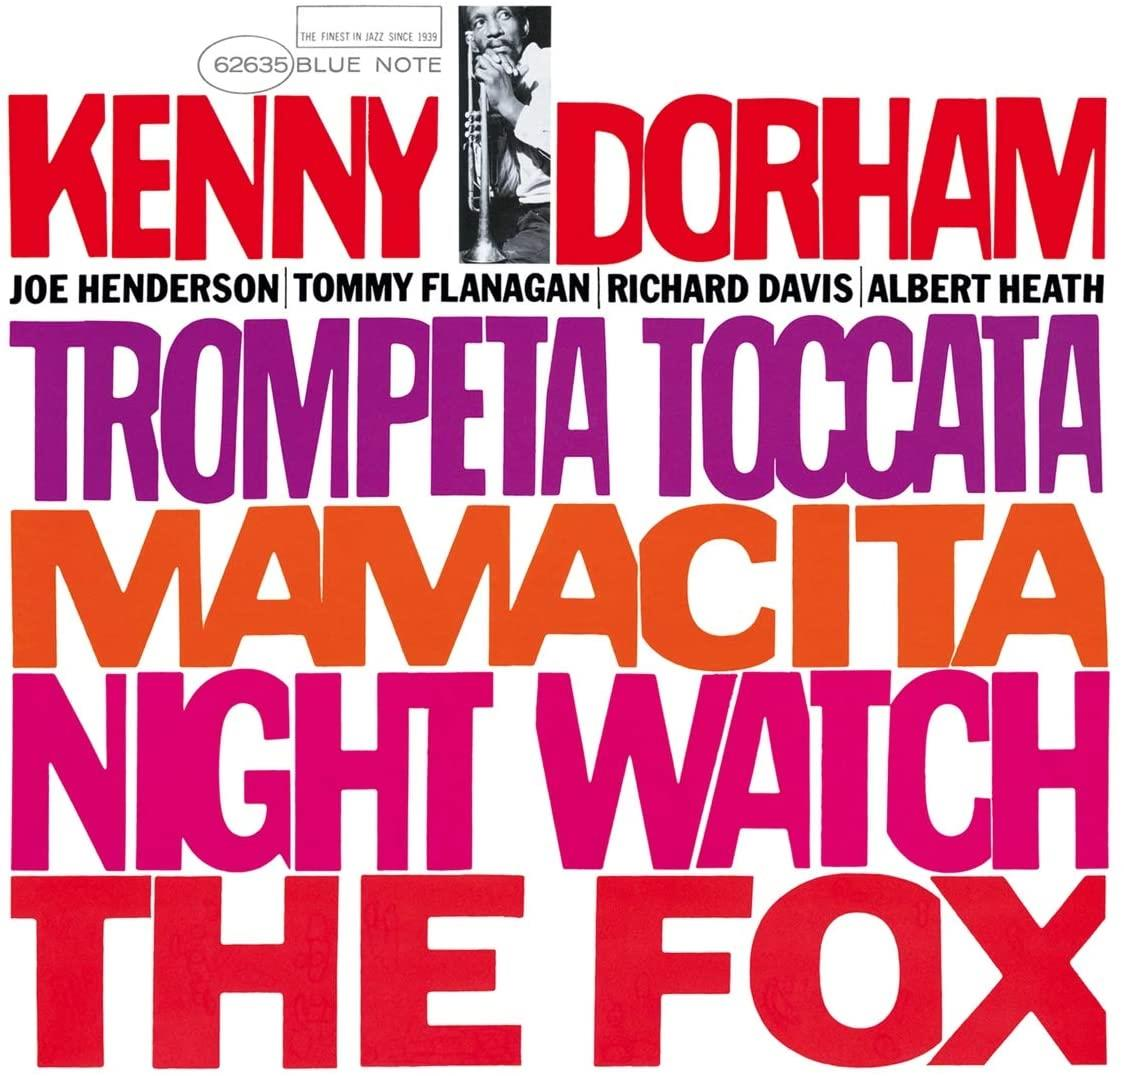 Kenny Dorham - Trompeta Toccata [LP]